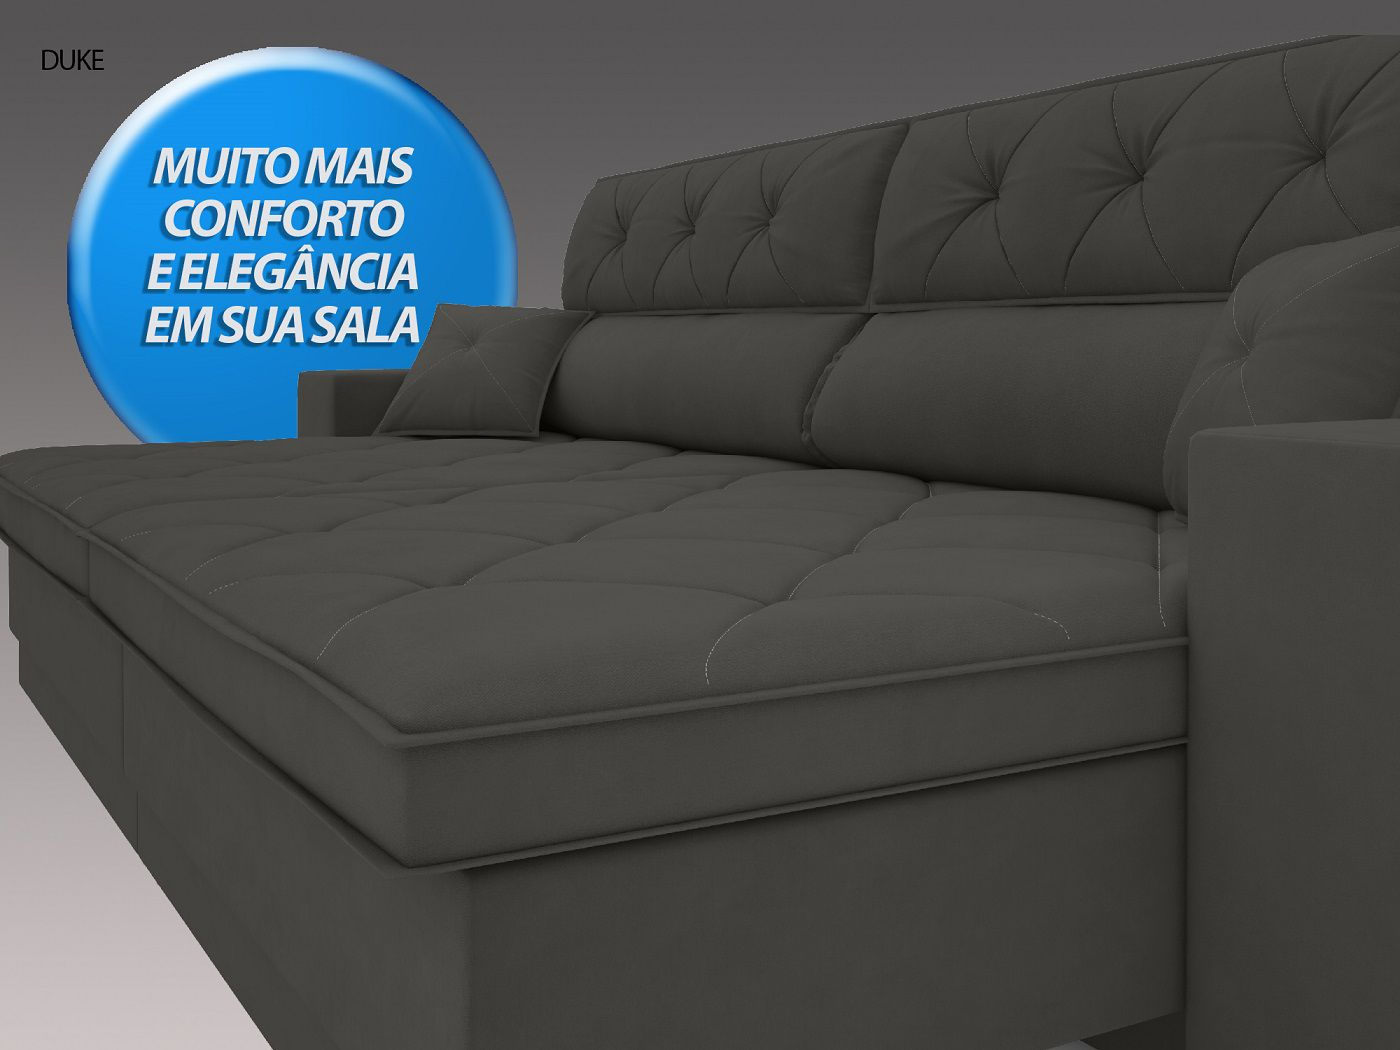 Sofá Duke 2,30m Retrátil e Reclinável Velosuede Cinza - NETSOFAS